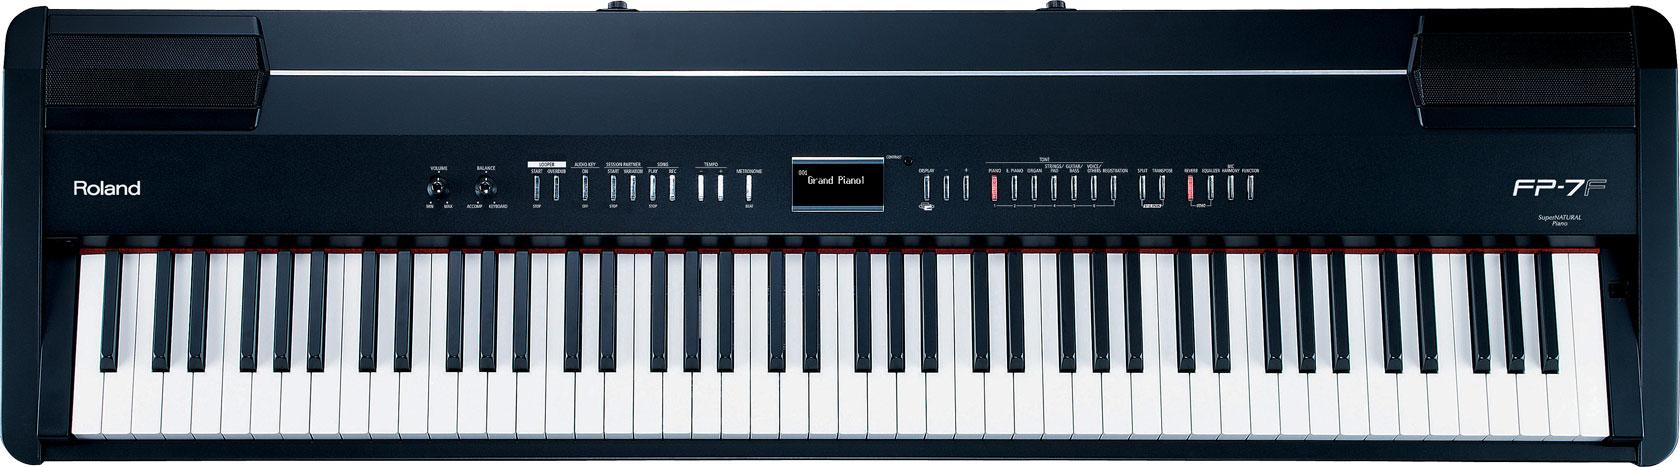 Roland FP-7F